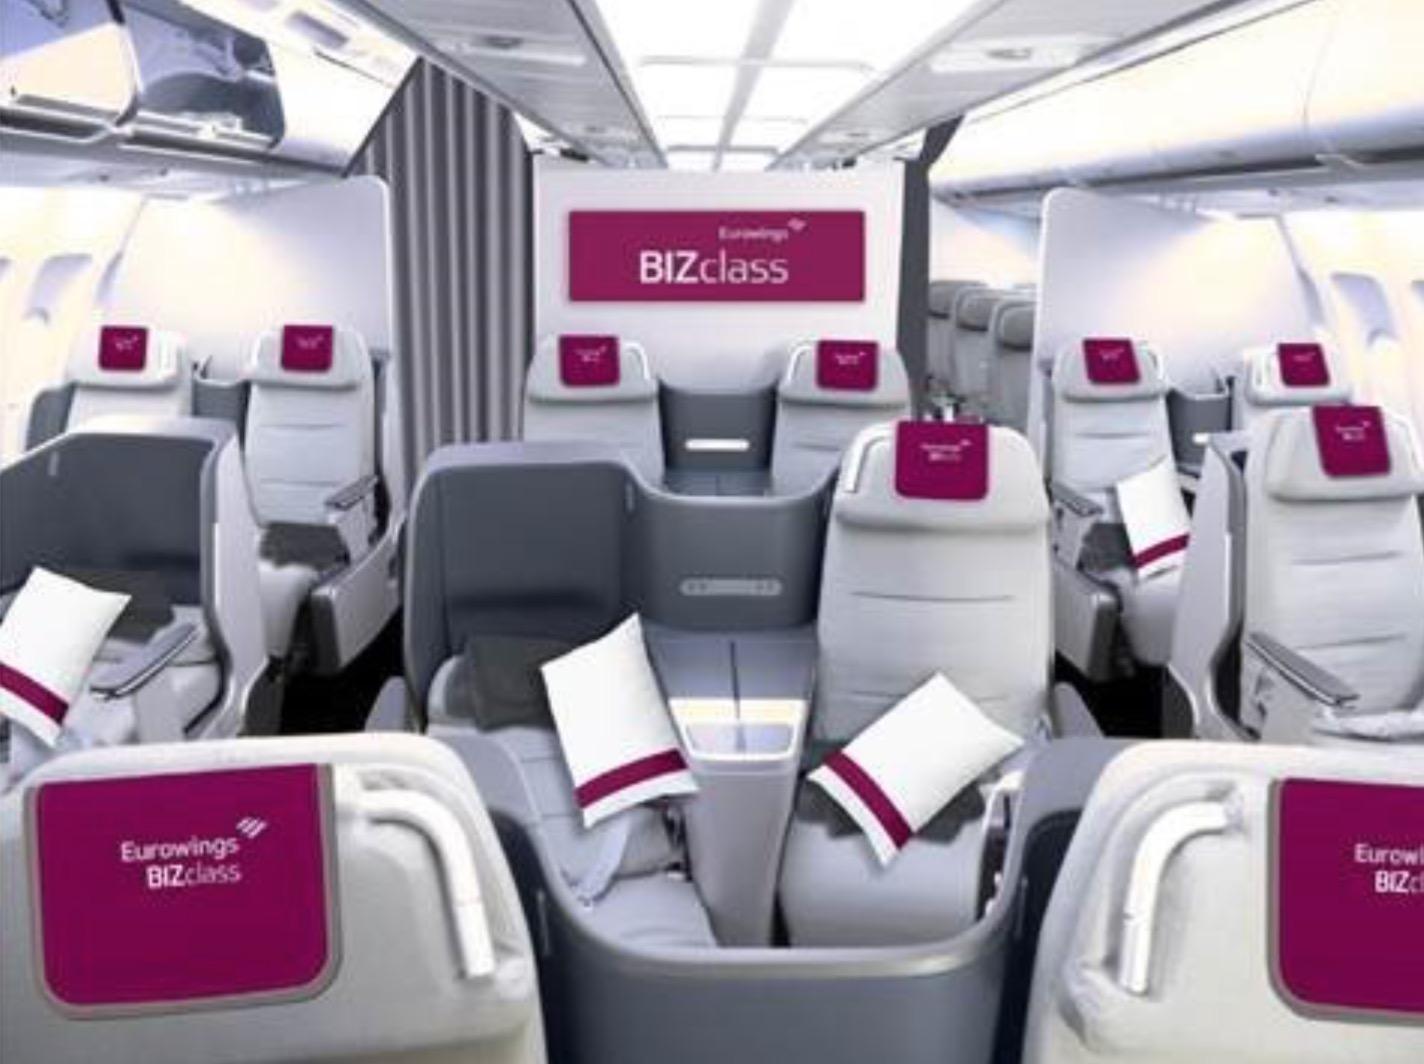 Eurowings business class